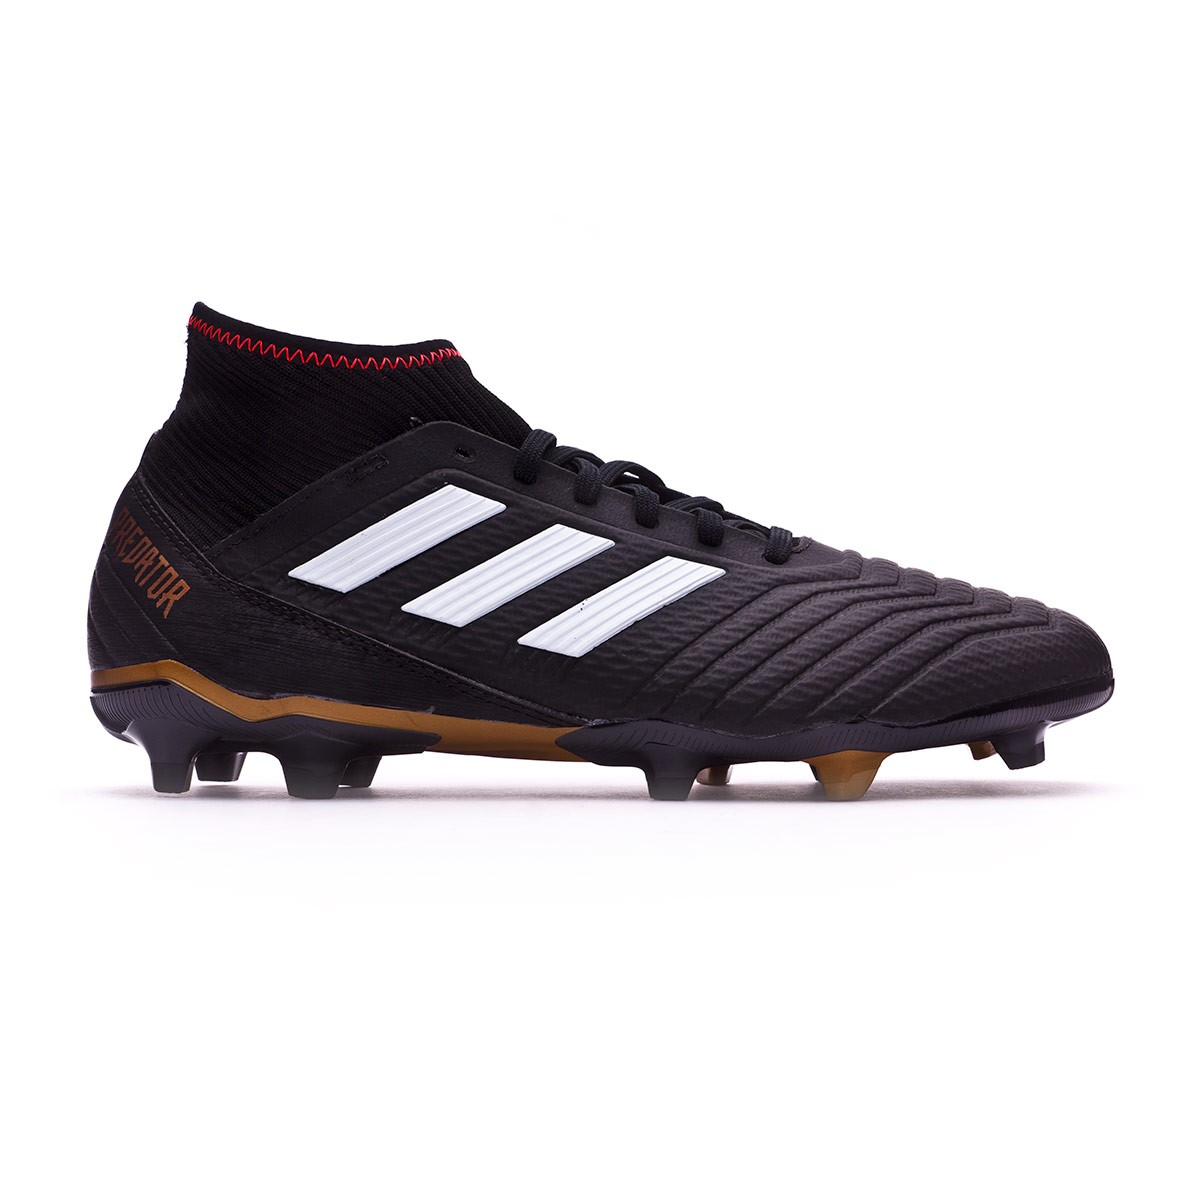 ca4b3399 Zapatos de fútbol adidas Predator 18.3 FG Core black-White-Gold  metallic-Solar red - Tienda de fútbol Fútbol Emotion